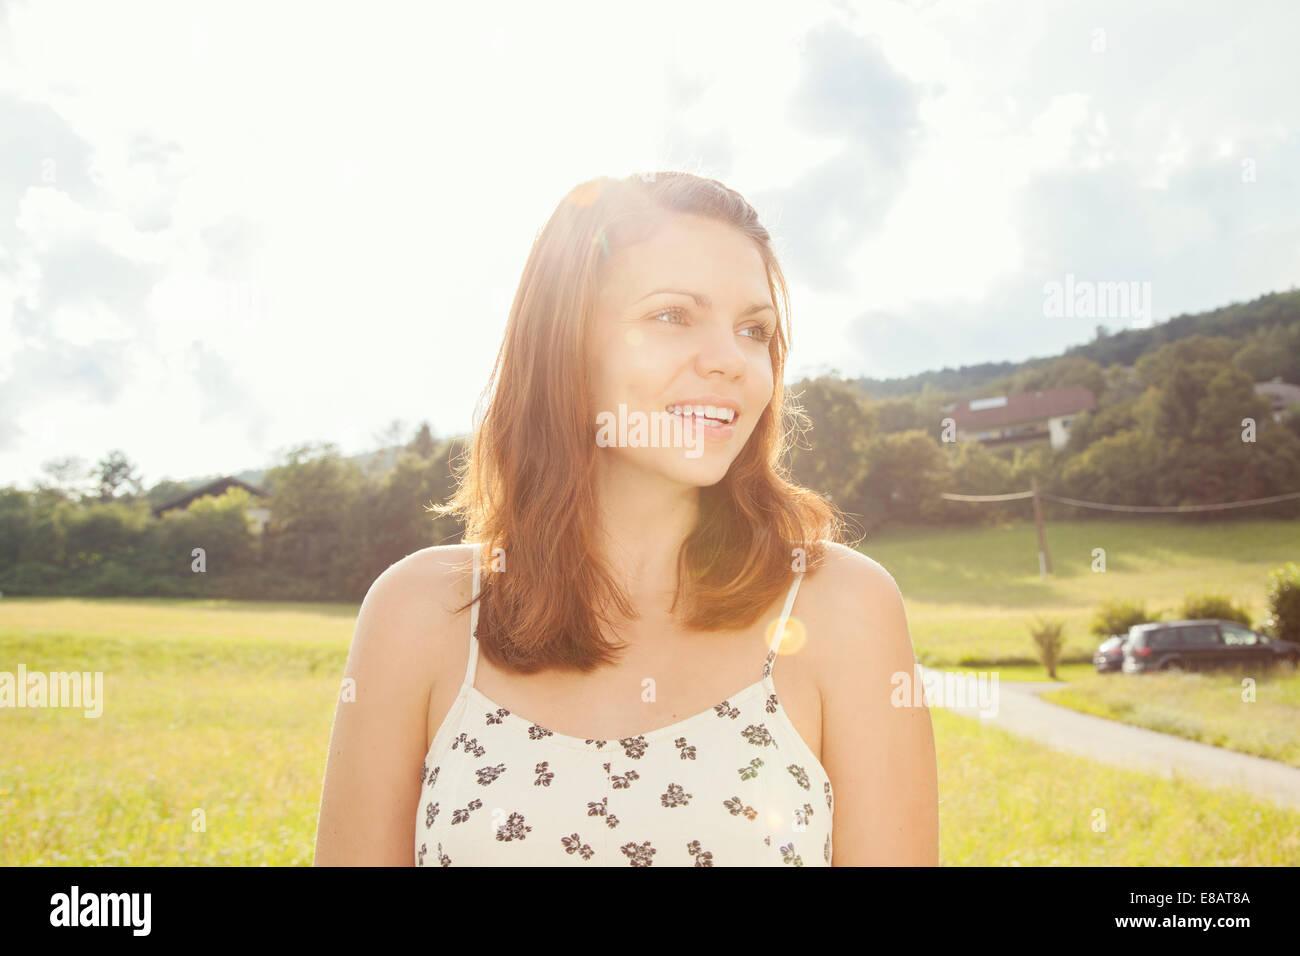 Junge Frau mit braunen Haaren, wegschauen Stockbild